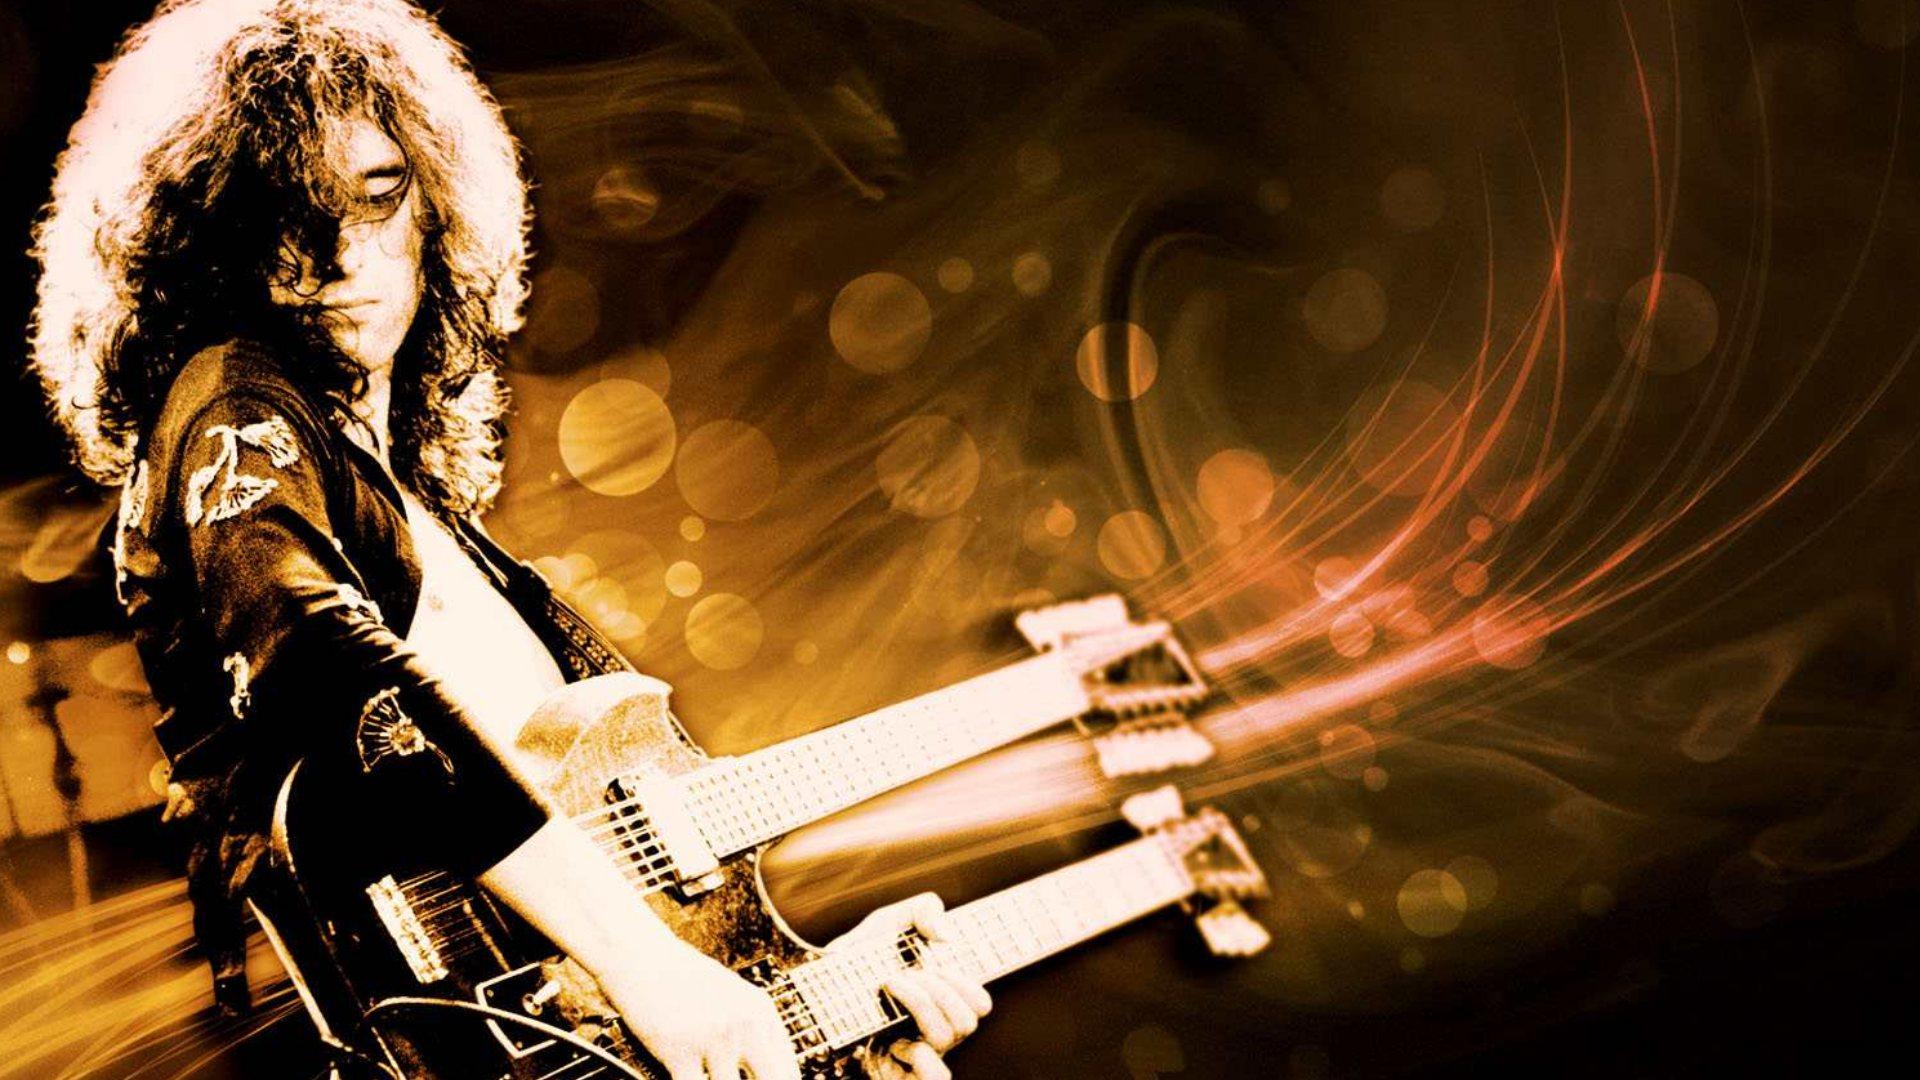 Jimmy Page - 1920x1080